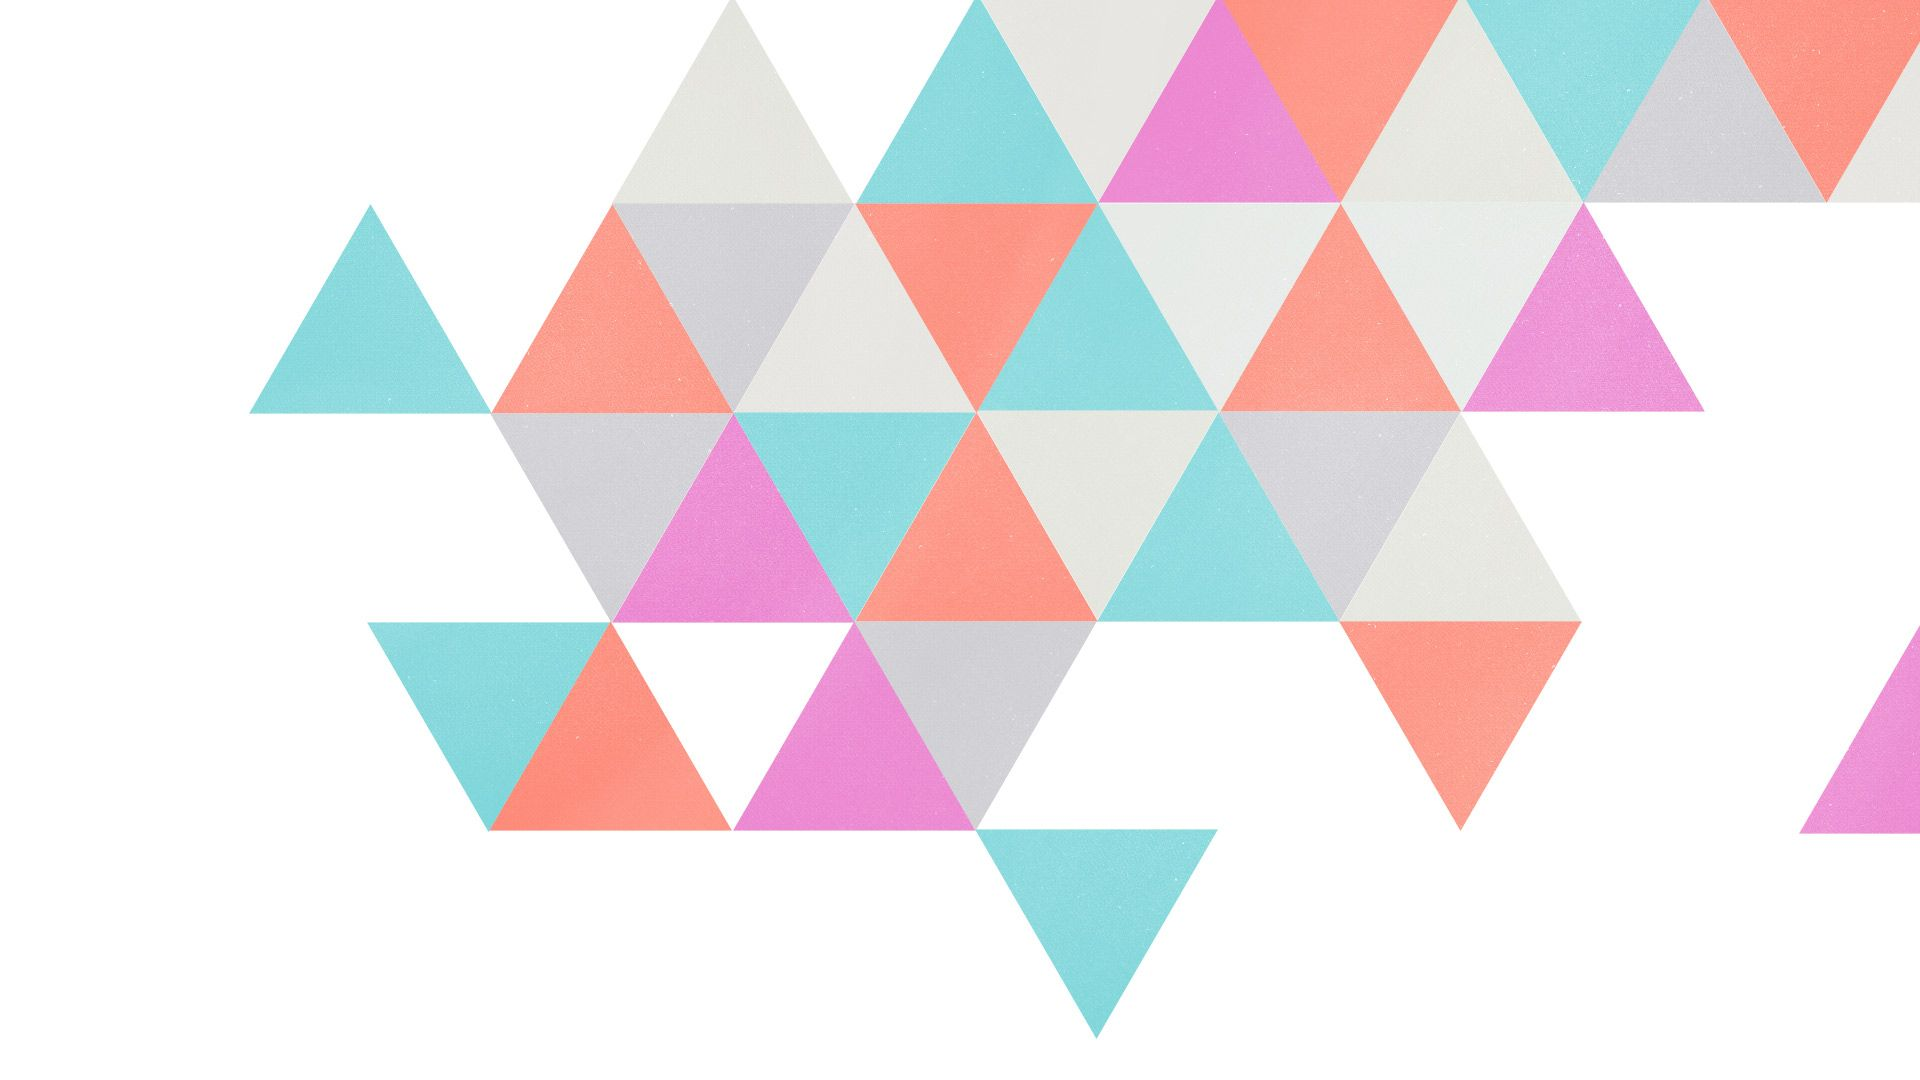 Wonderful Wallpaper Mac Geometric - b46c8e1cde764e377f0ed9399e6380a6  Picture_1003528.jpg